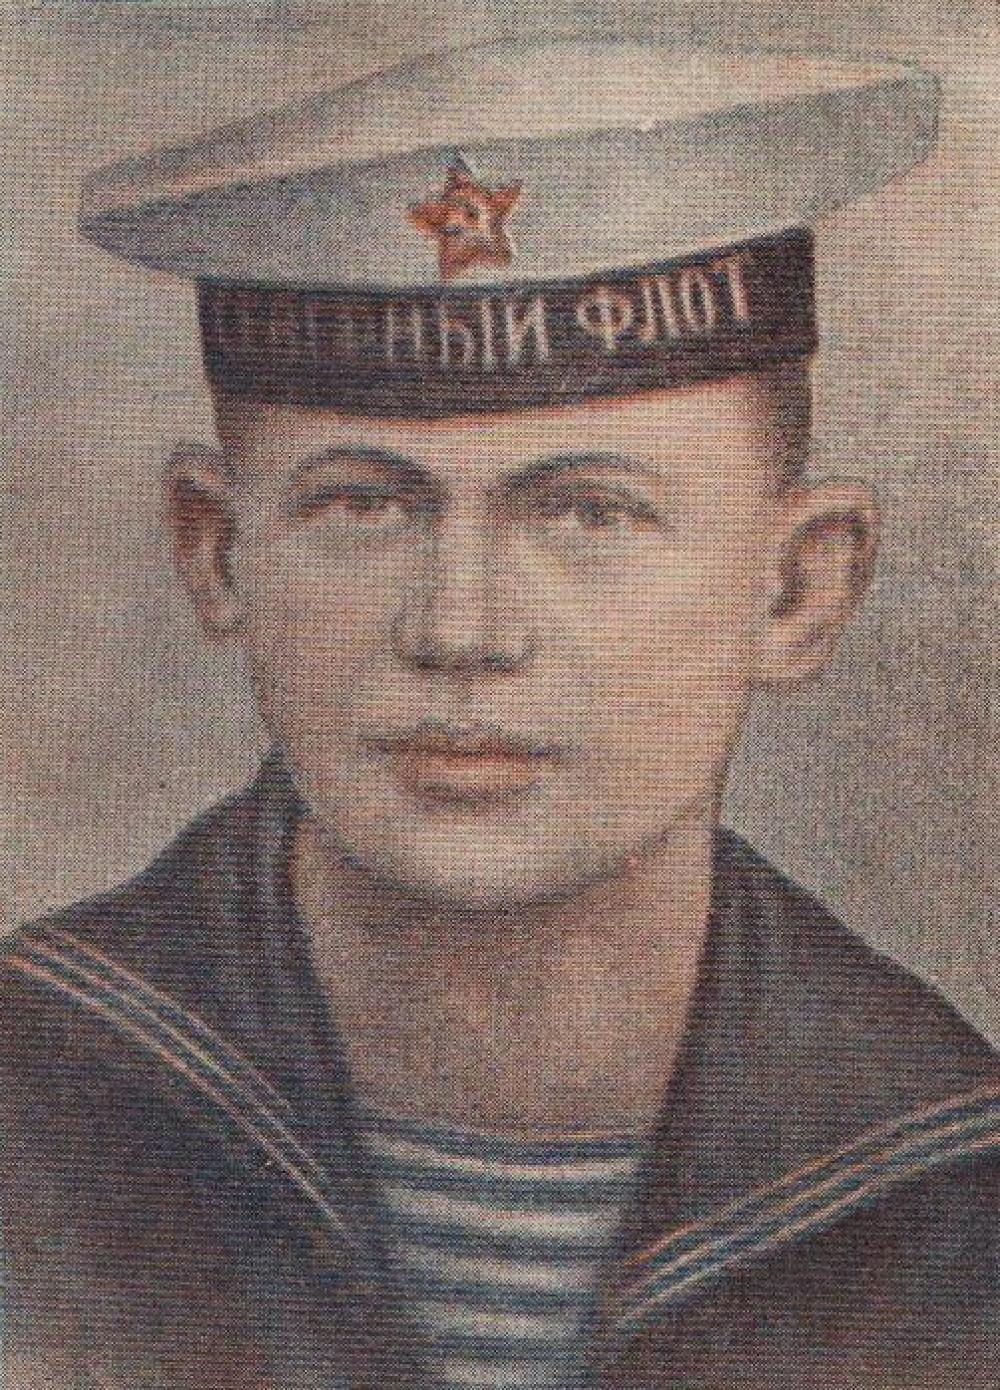 Иван Михайлович Сивко